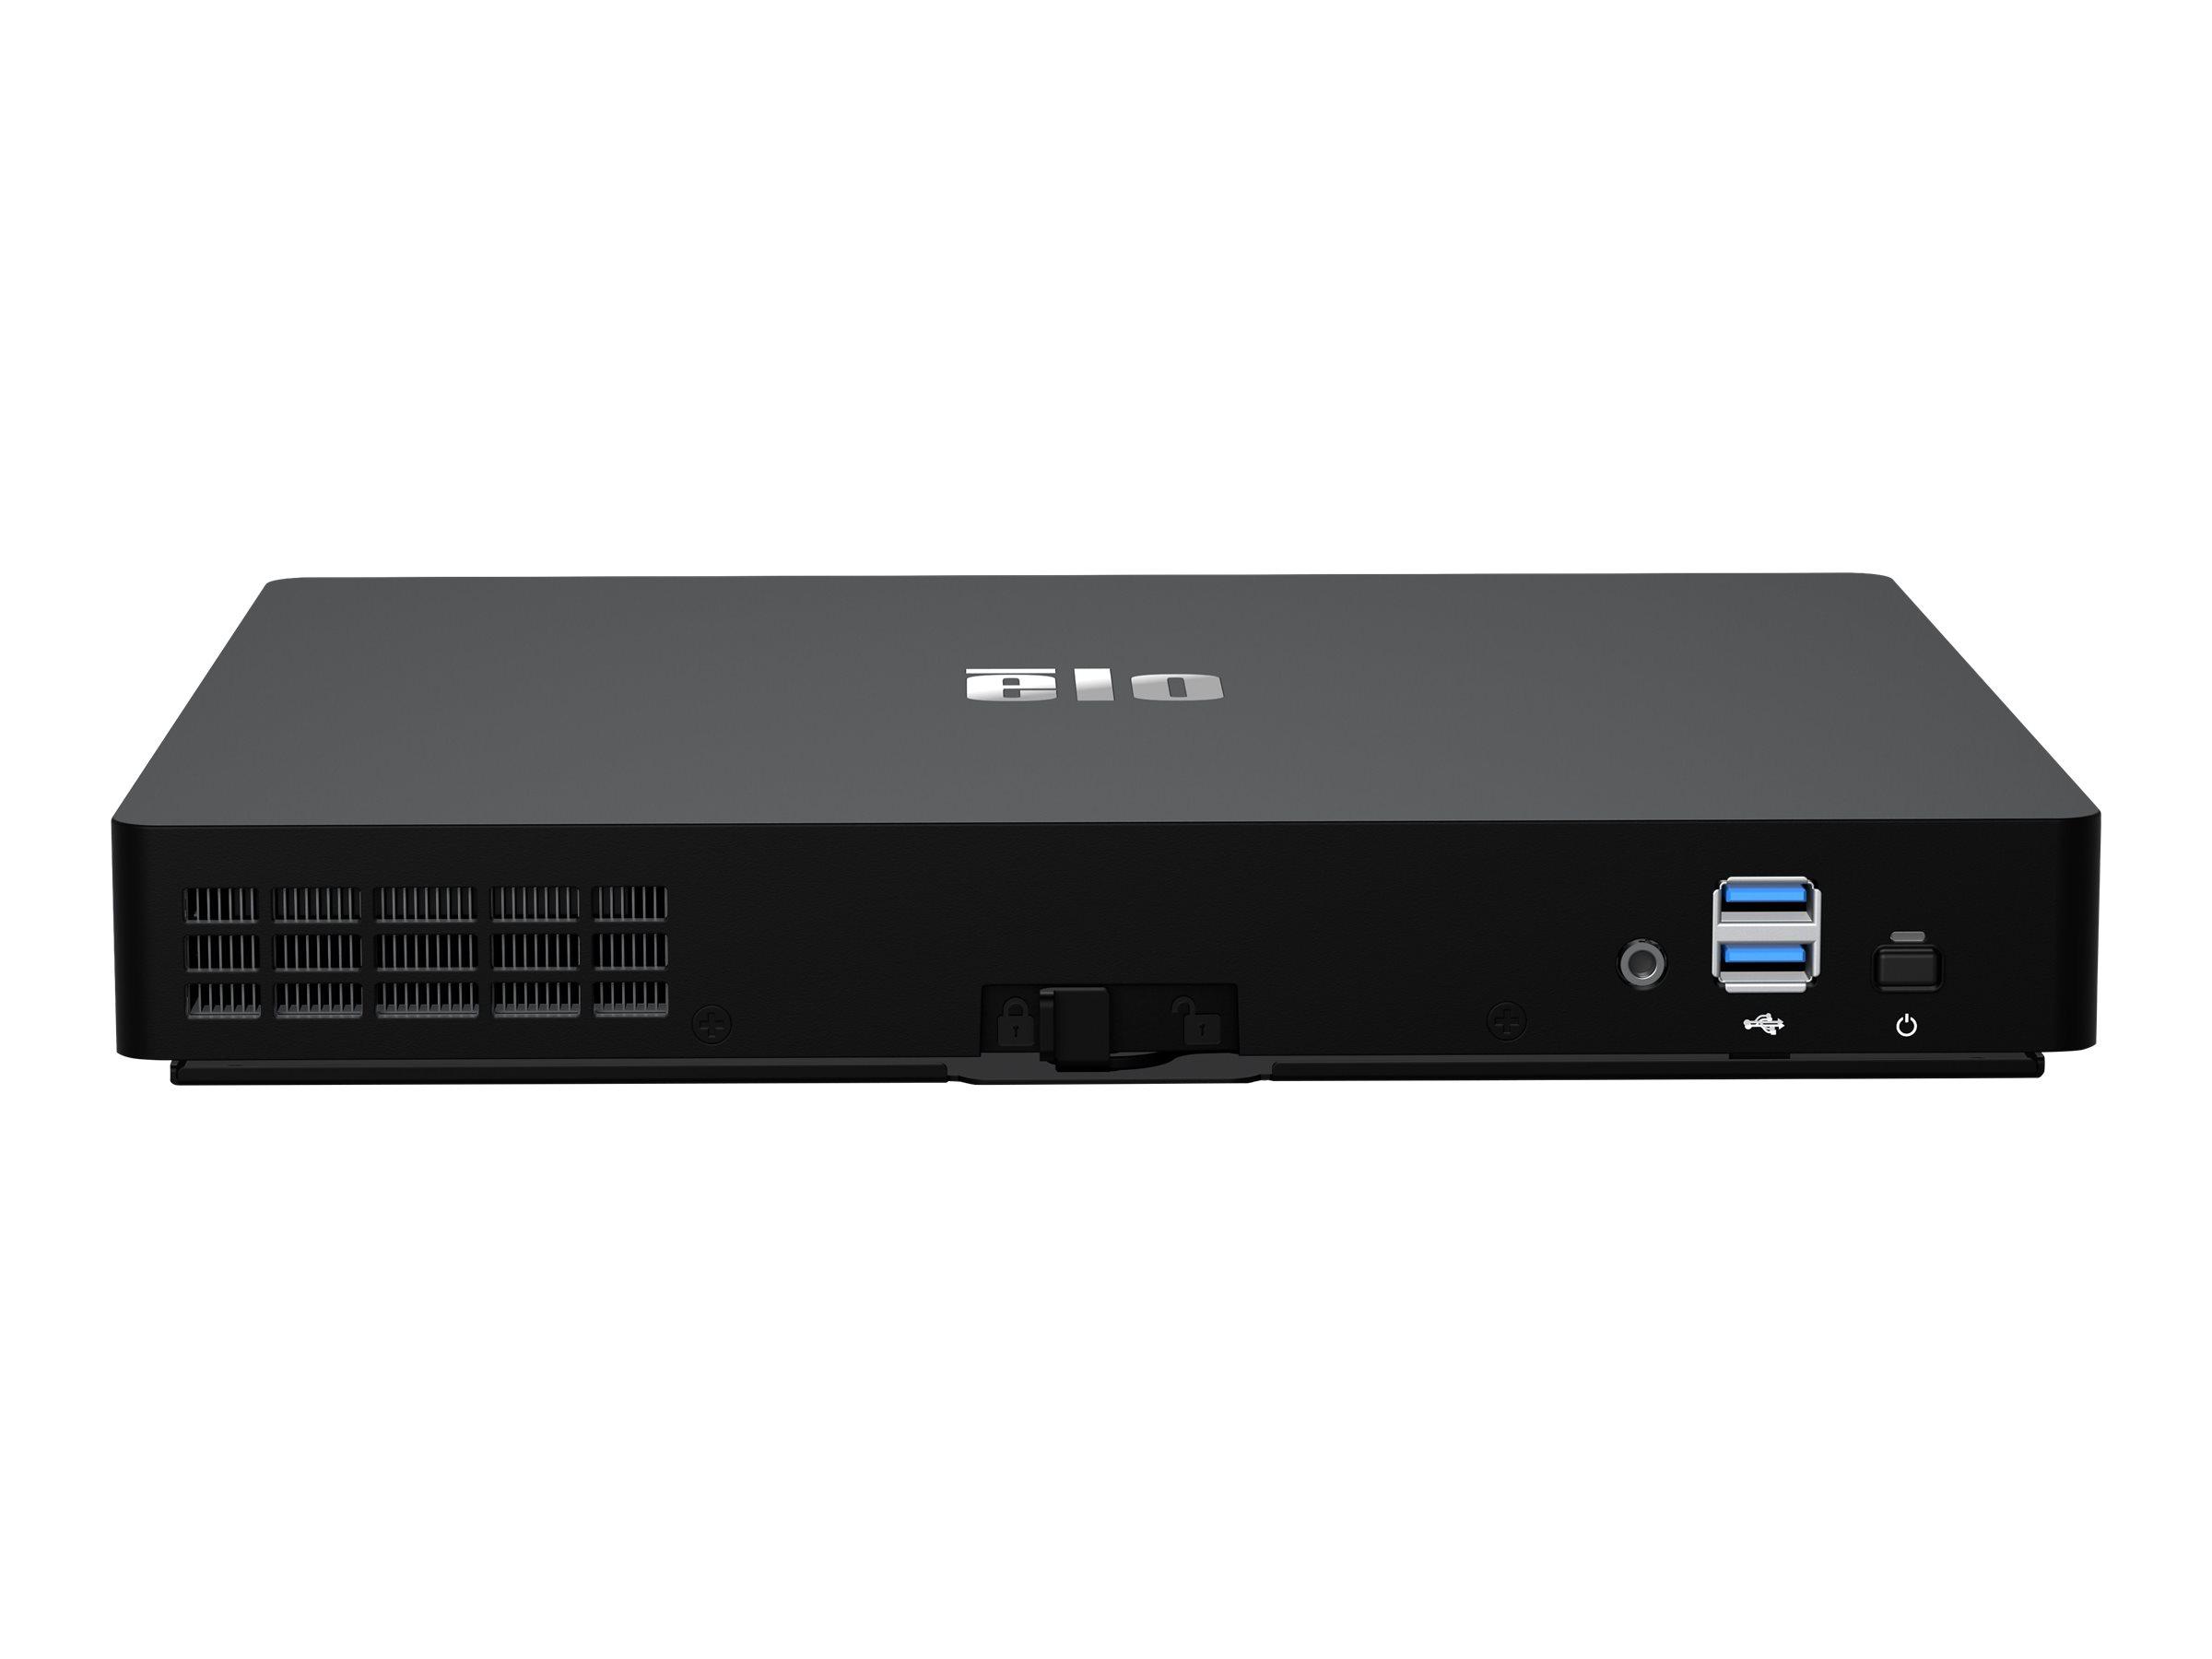 Elo EloPOS Pack EPS00E5 - mini desktop - Core i5 8500T 2.1 GHz - 8 GB - SSD 128 GB